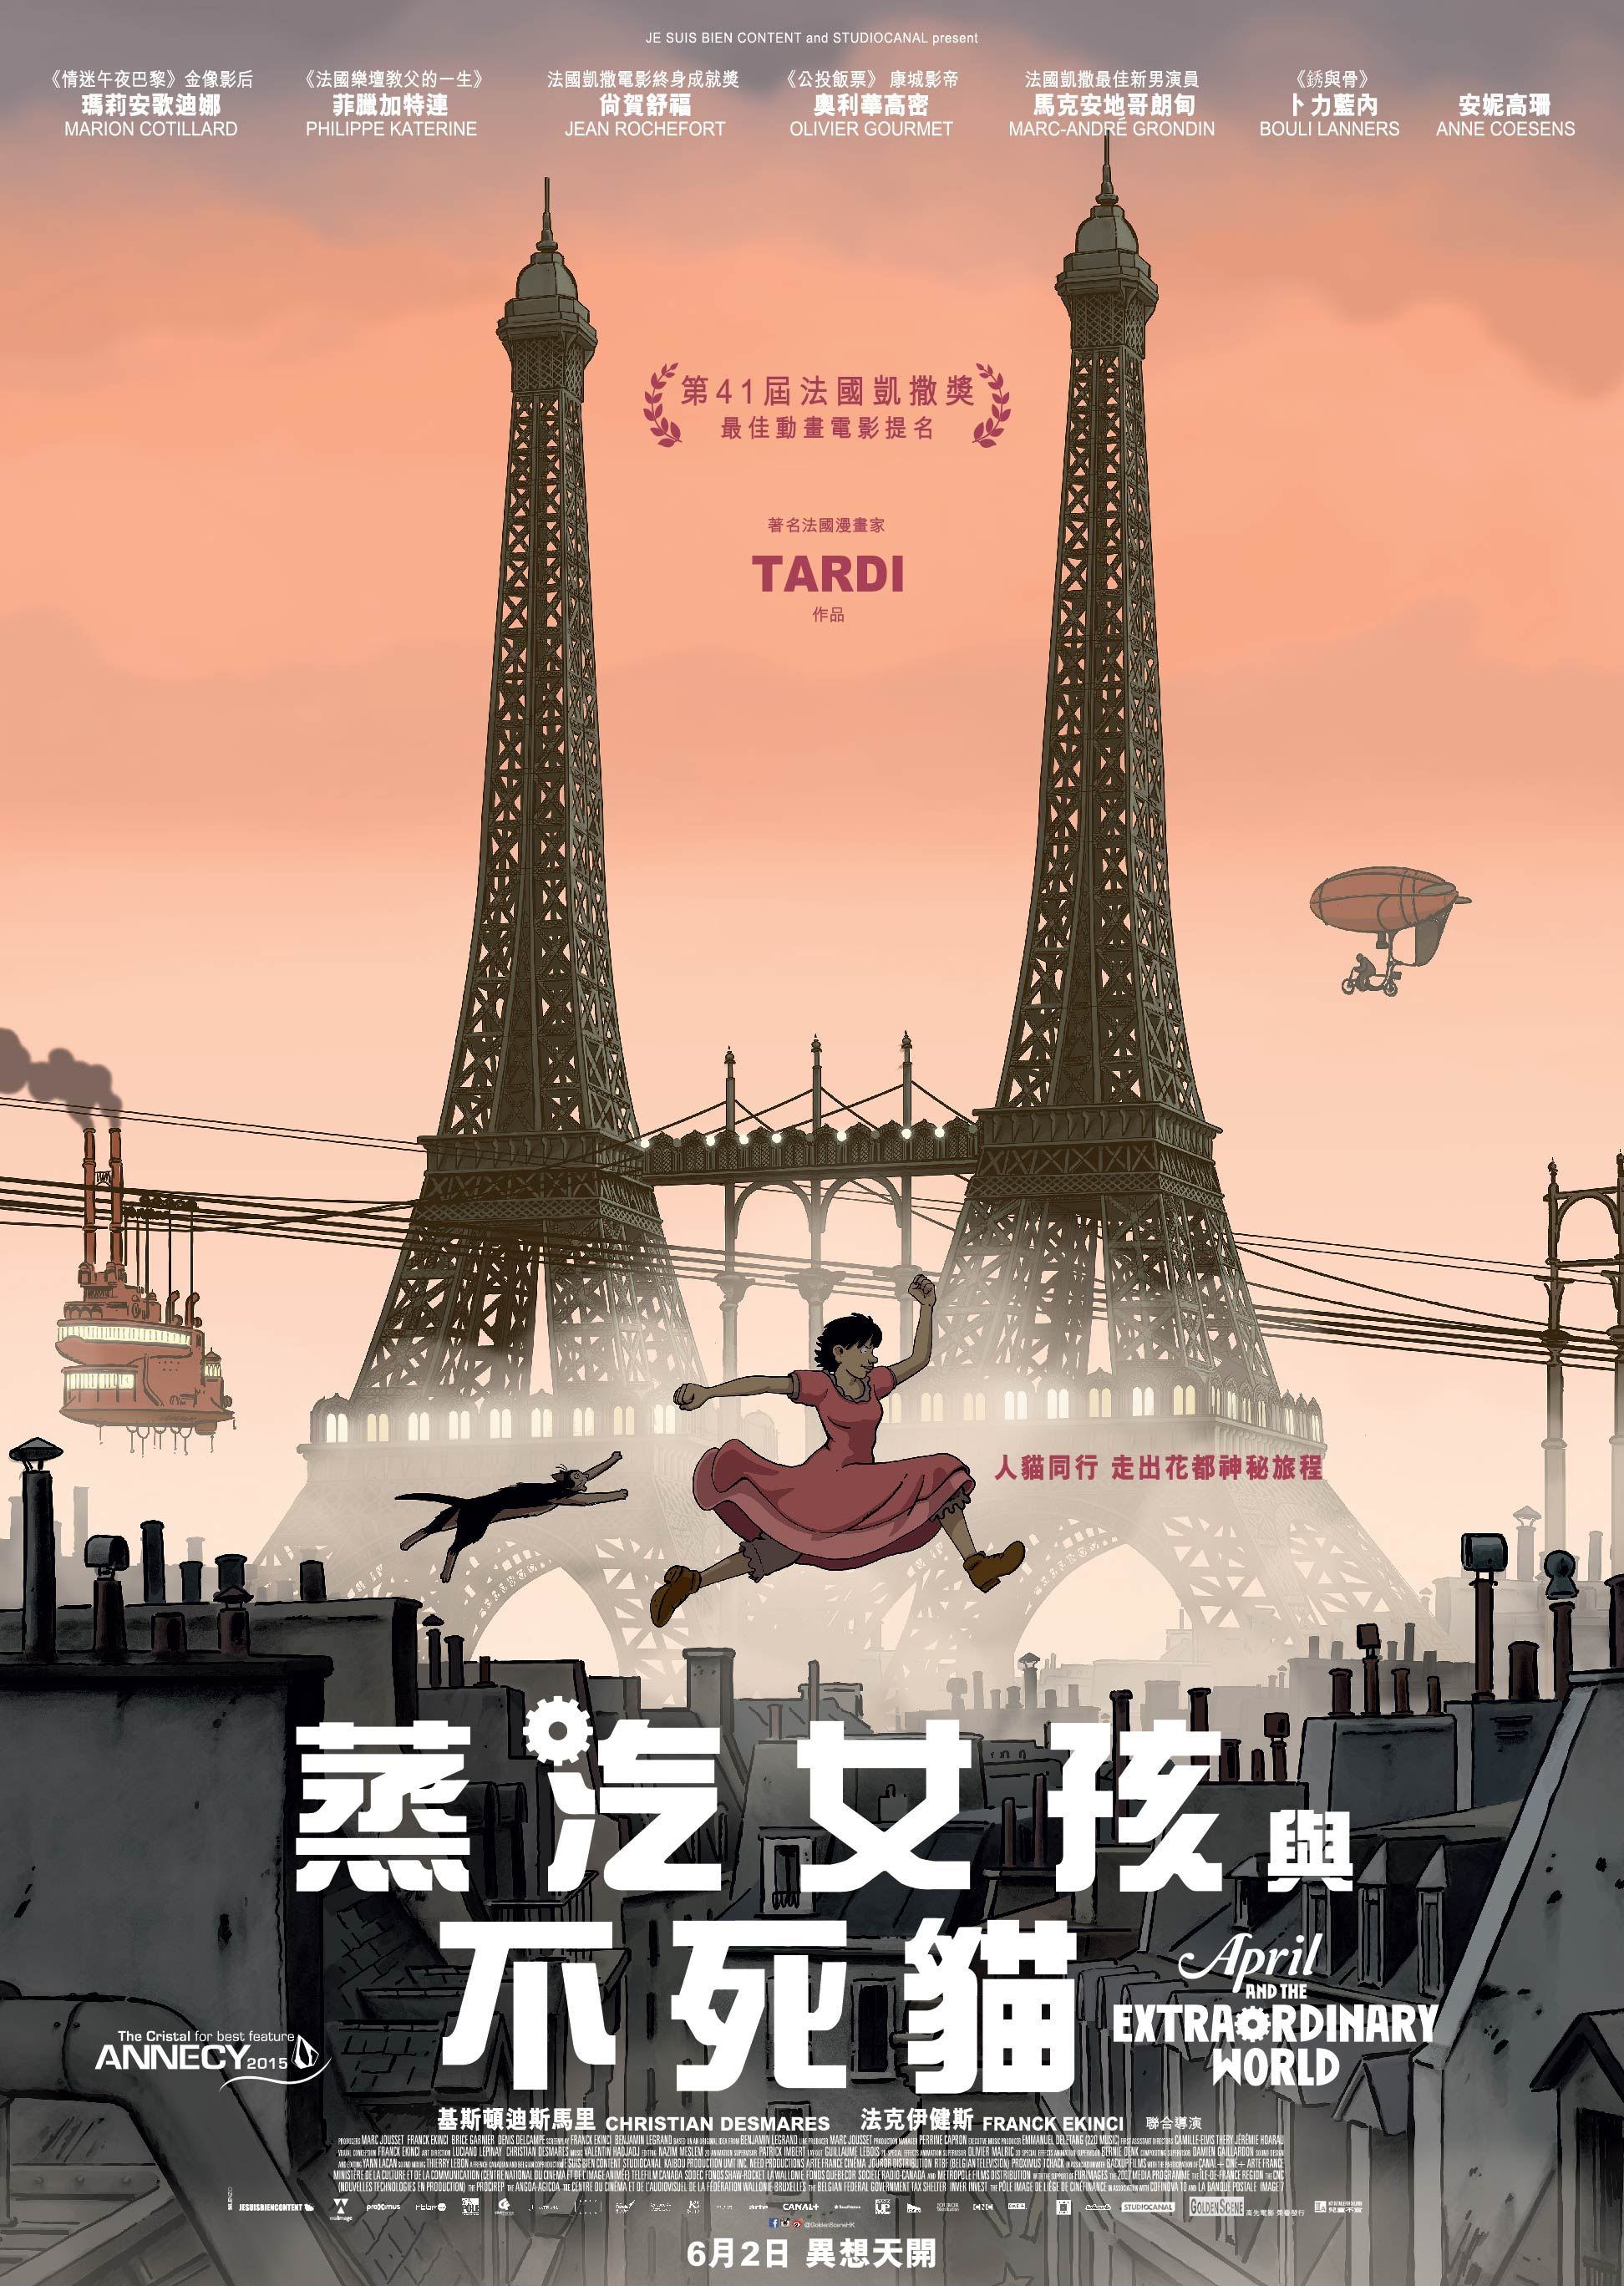 https://www.hkedcity.net/english/sites/default/files/grs2/film/4/74/cover_184725.jpg